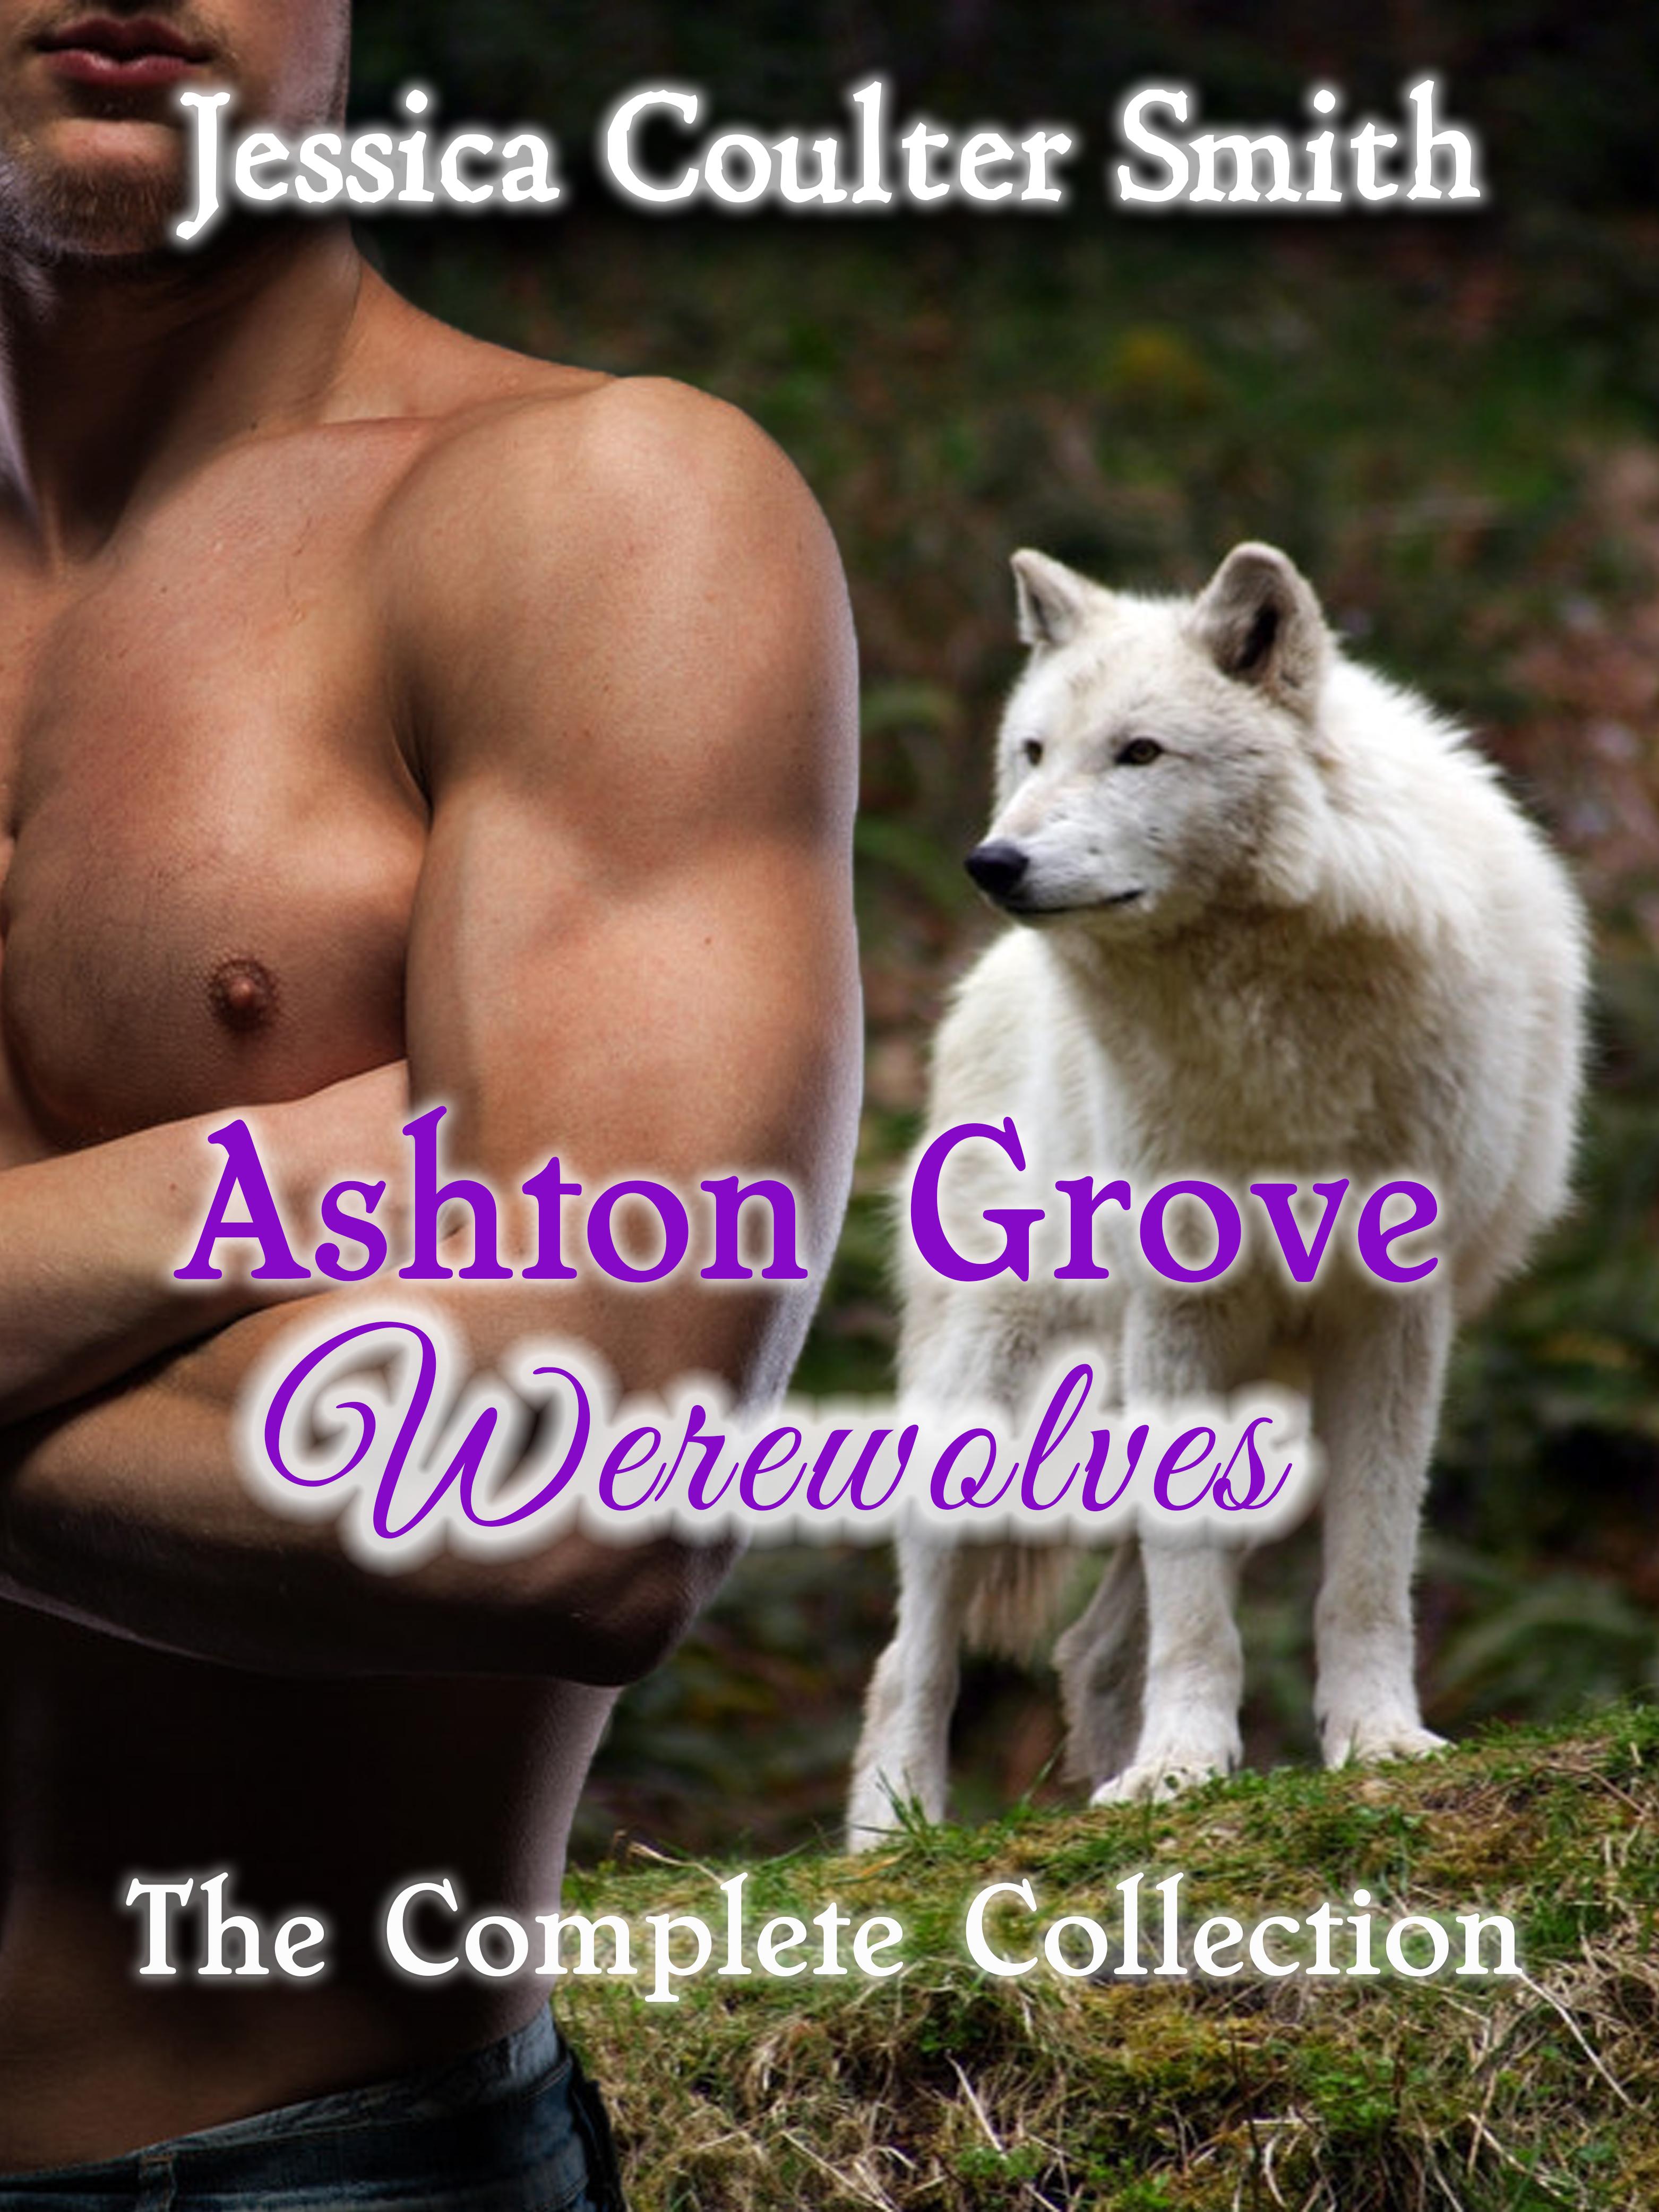 Ashton-Grove-Werewolves-The-Complete-Collection-original